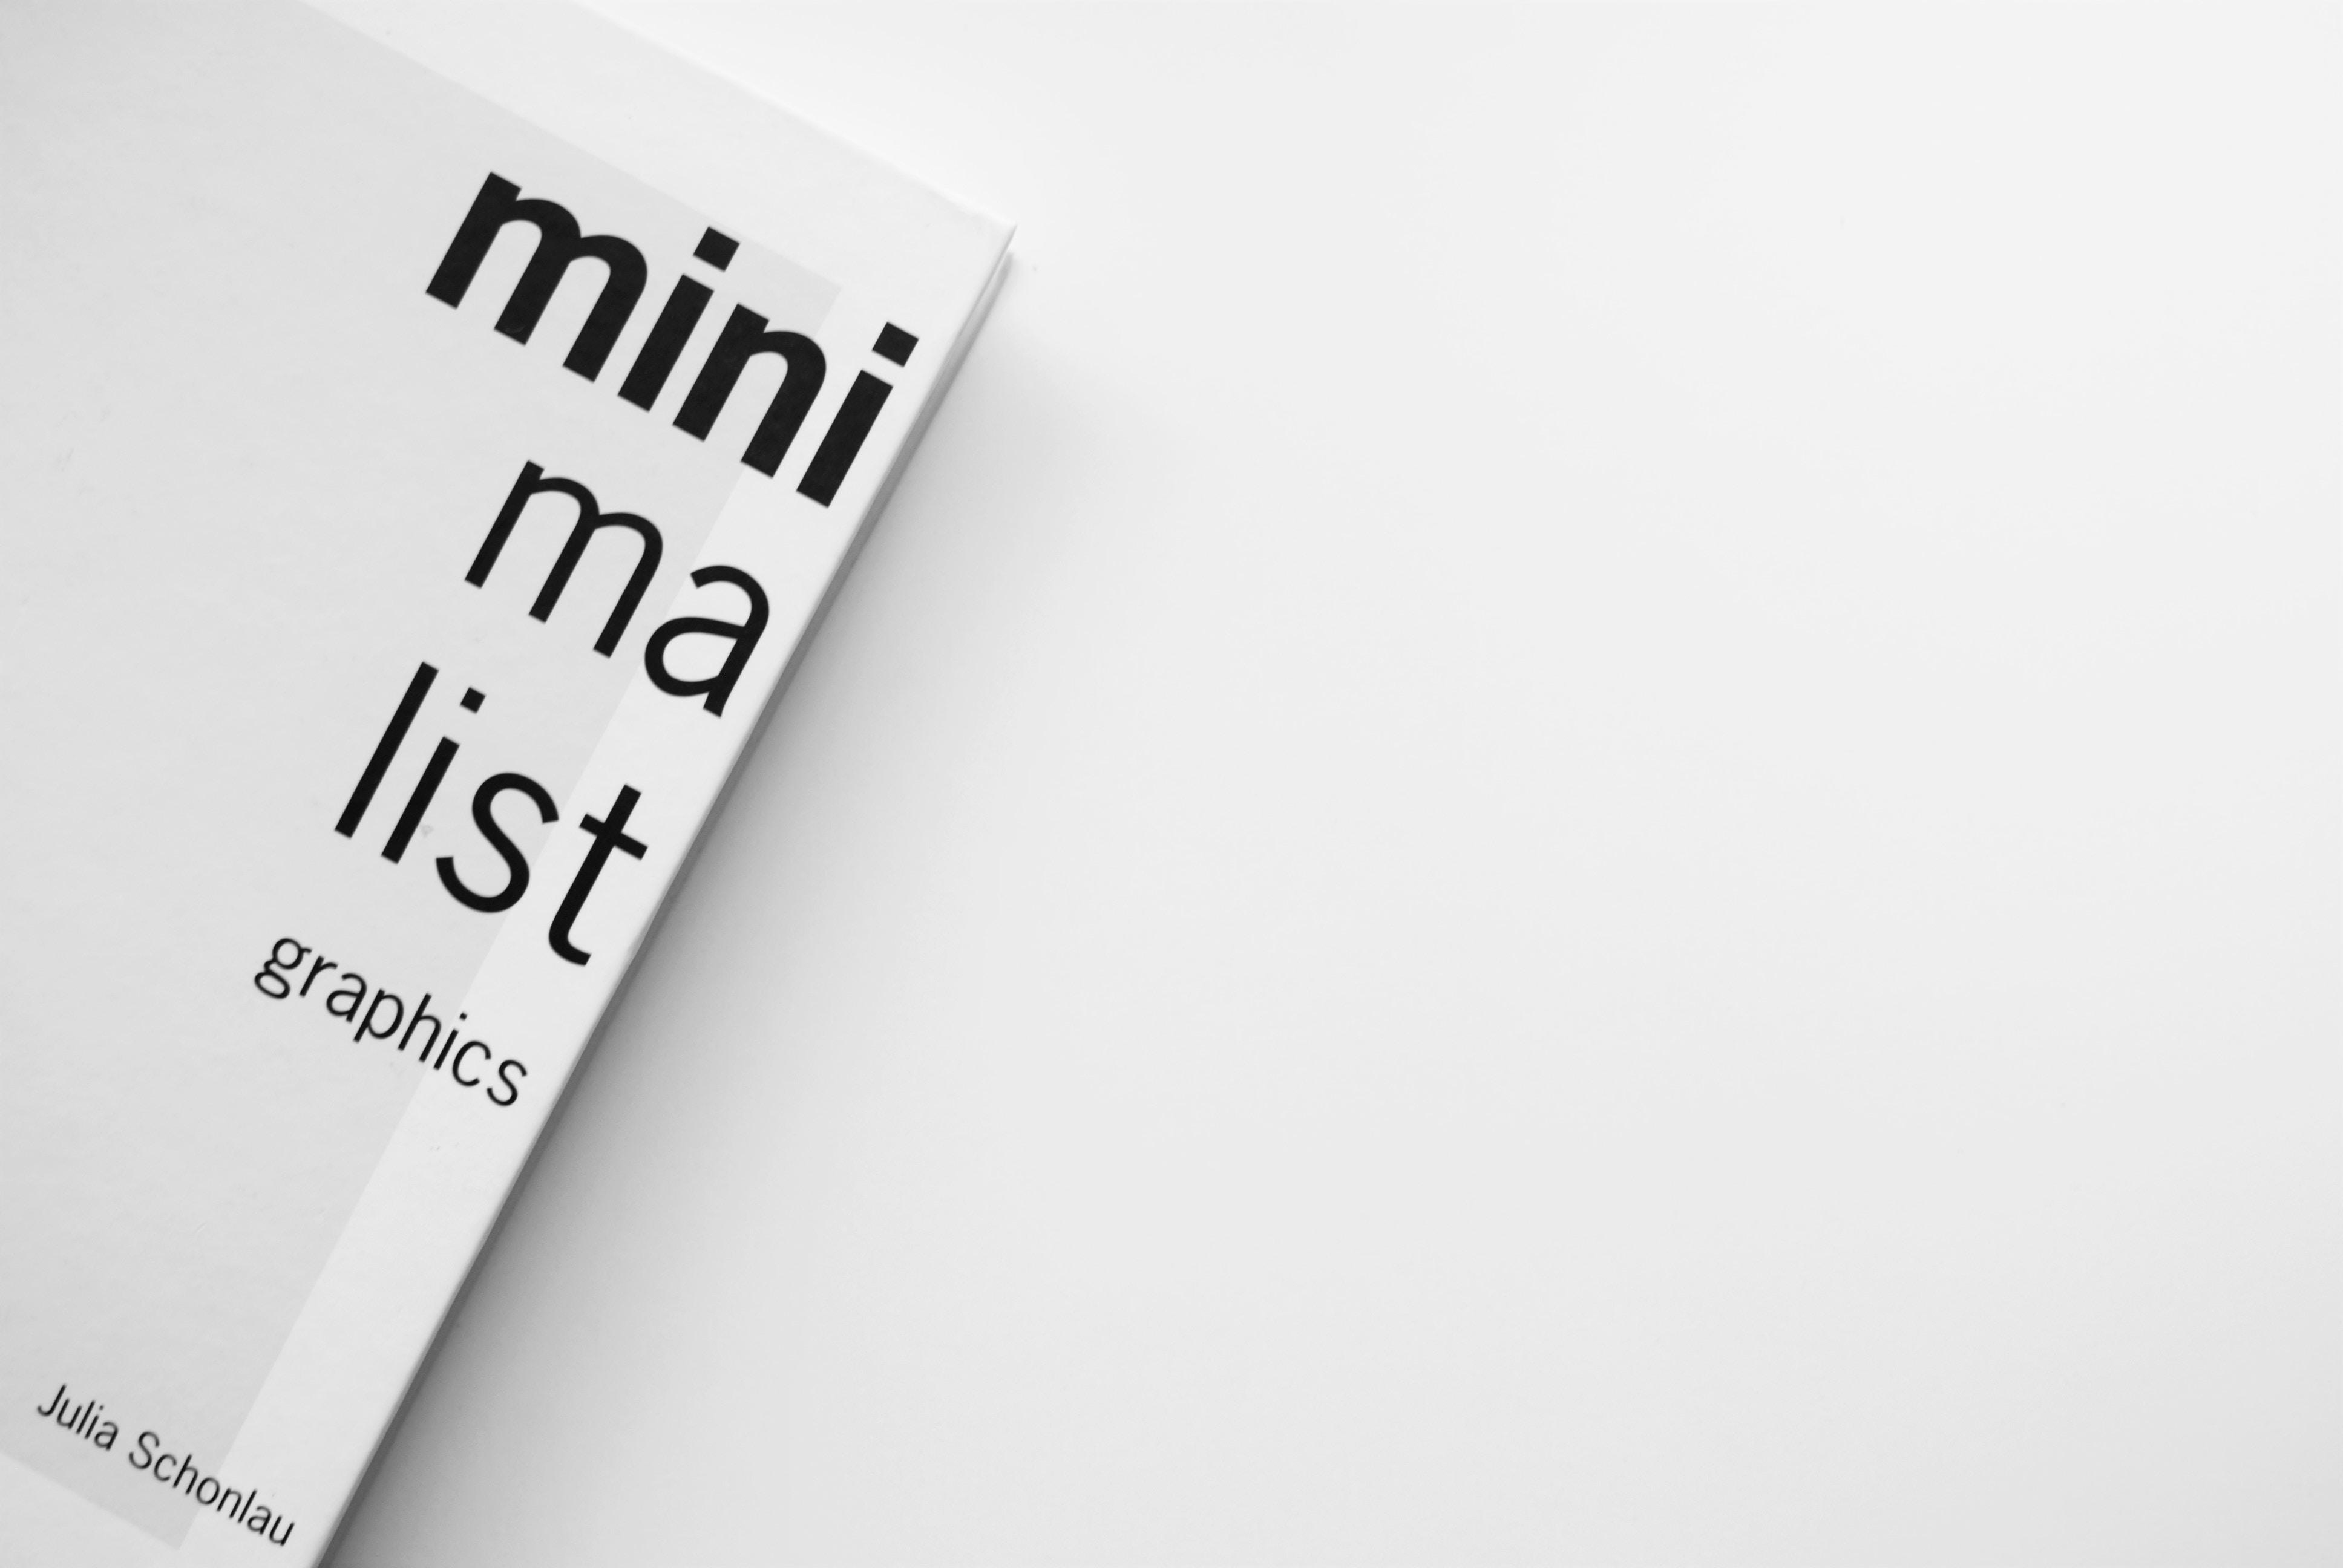 minimalist graphics by Julia Schonlau book